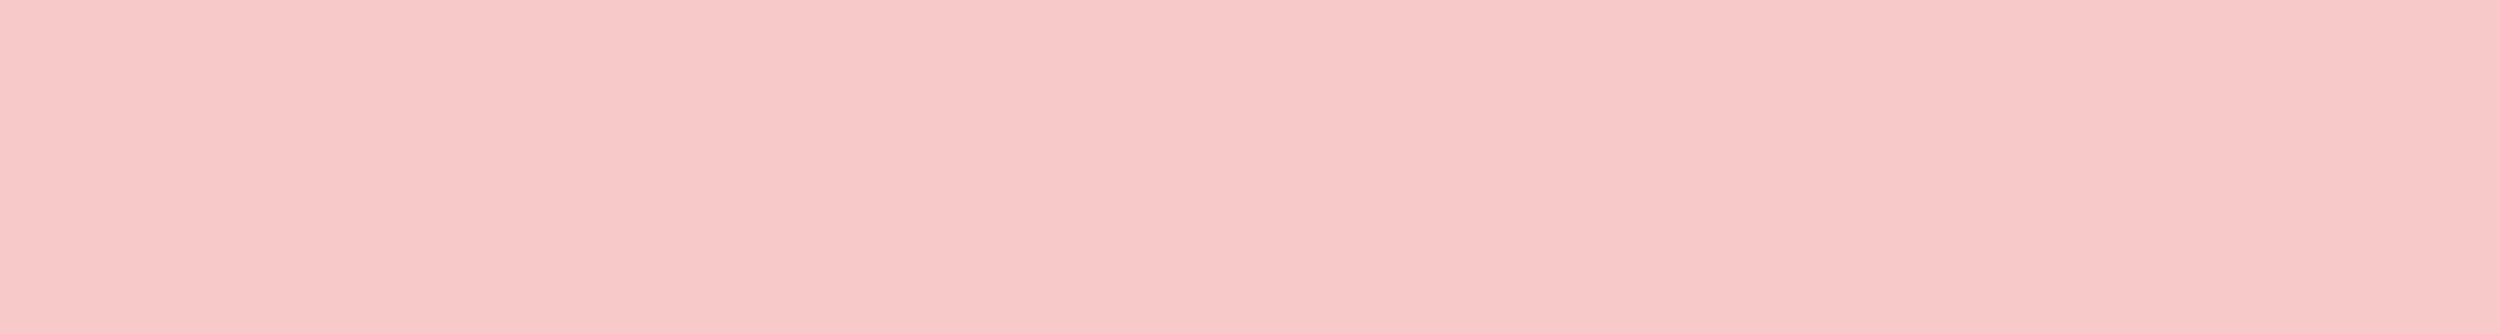 backgroundcolor-03.png